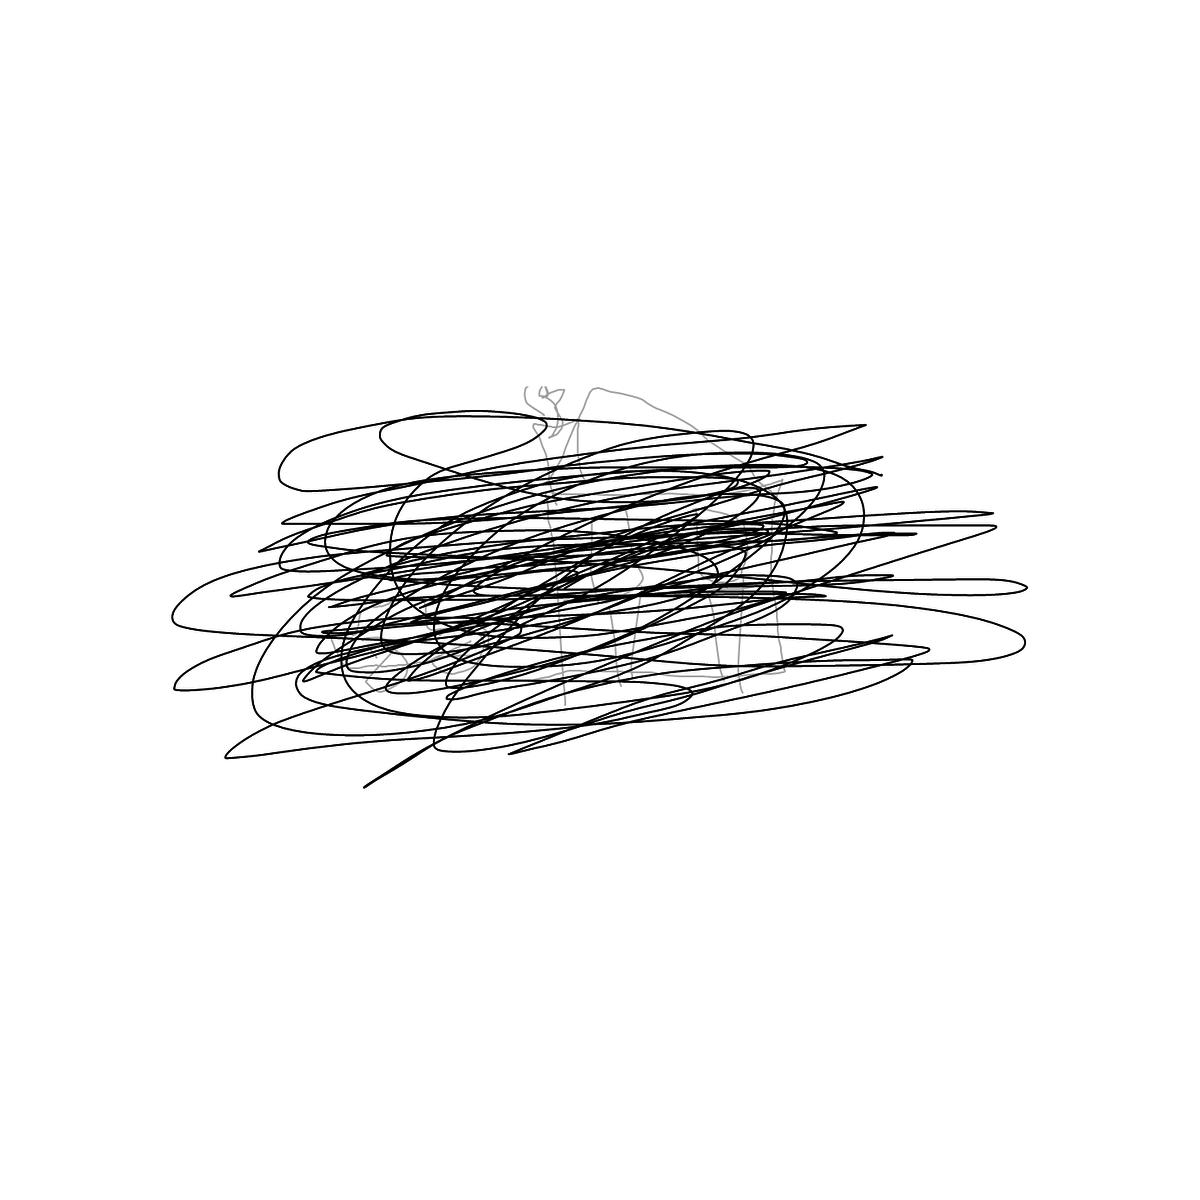 BAAAM drawing#1191 lat:44.5317840576171900lng: -78.4264221191406200